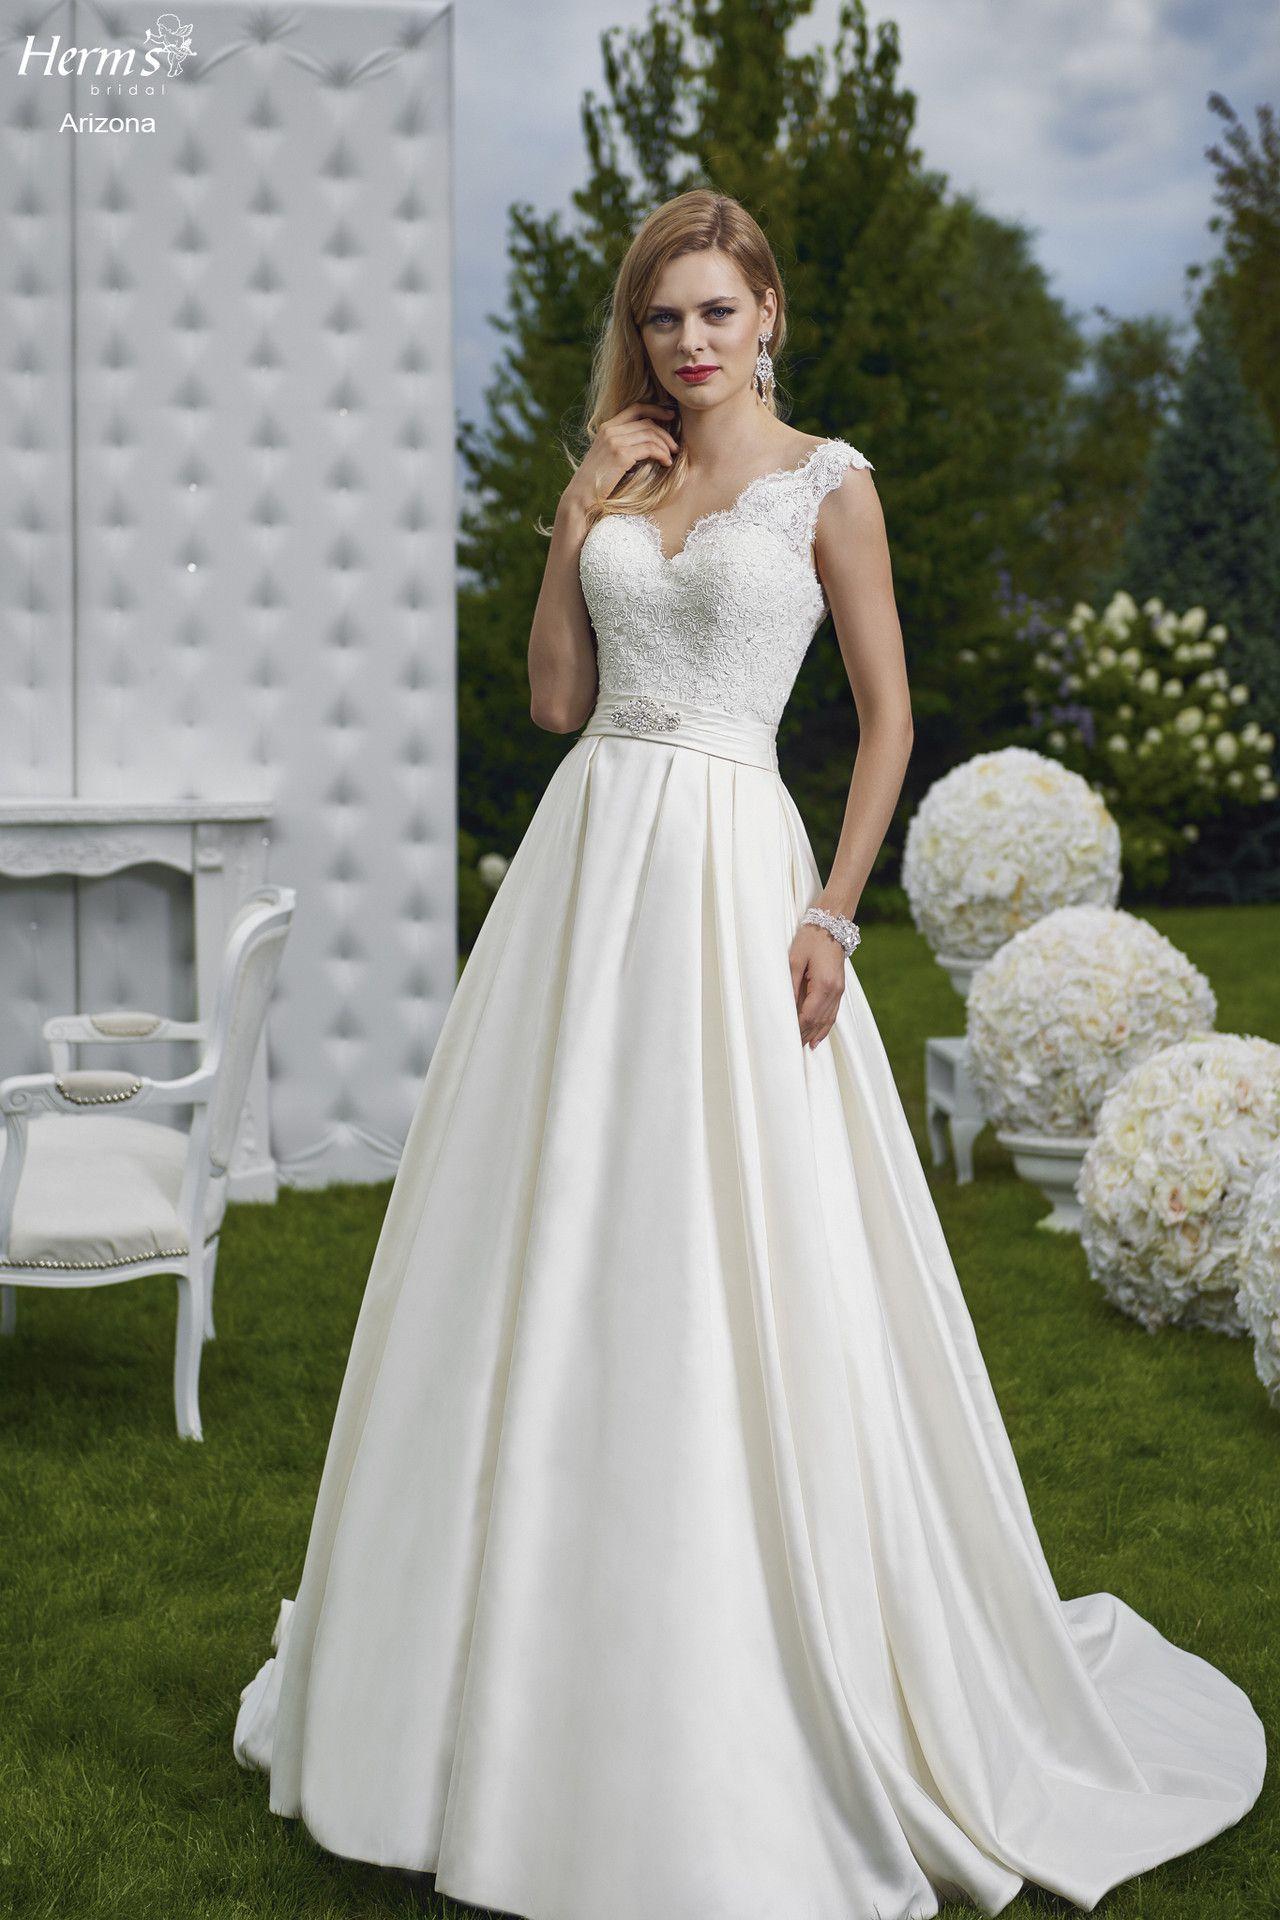 Suknie Slubne Garnitury Galeria Mody Slubnej Lodz Zdunska Wola Wedding Dresses Dresses Strapless Wedding Dress